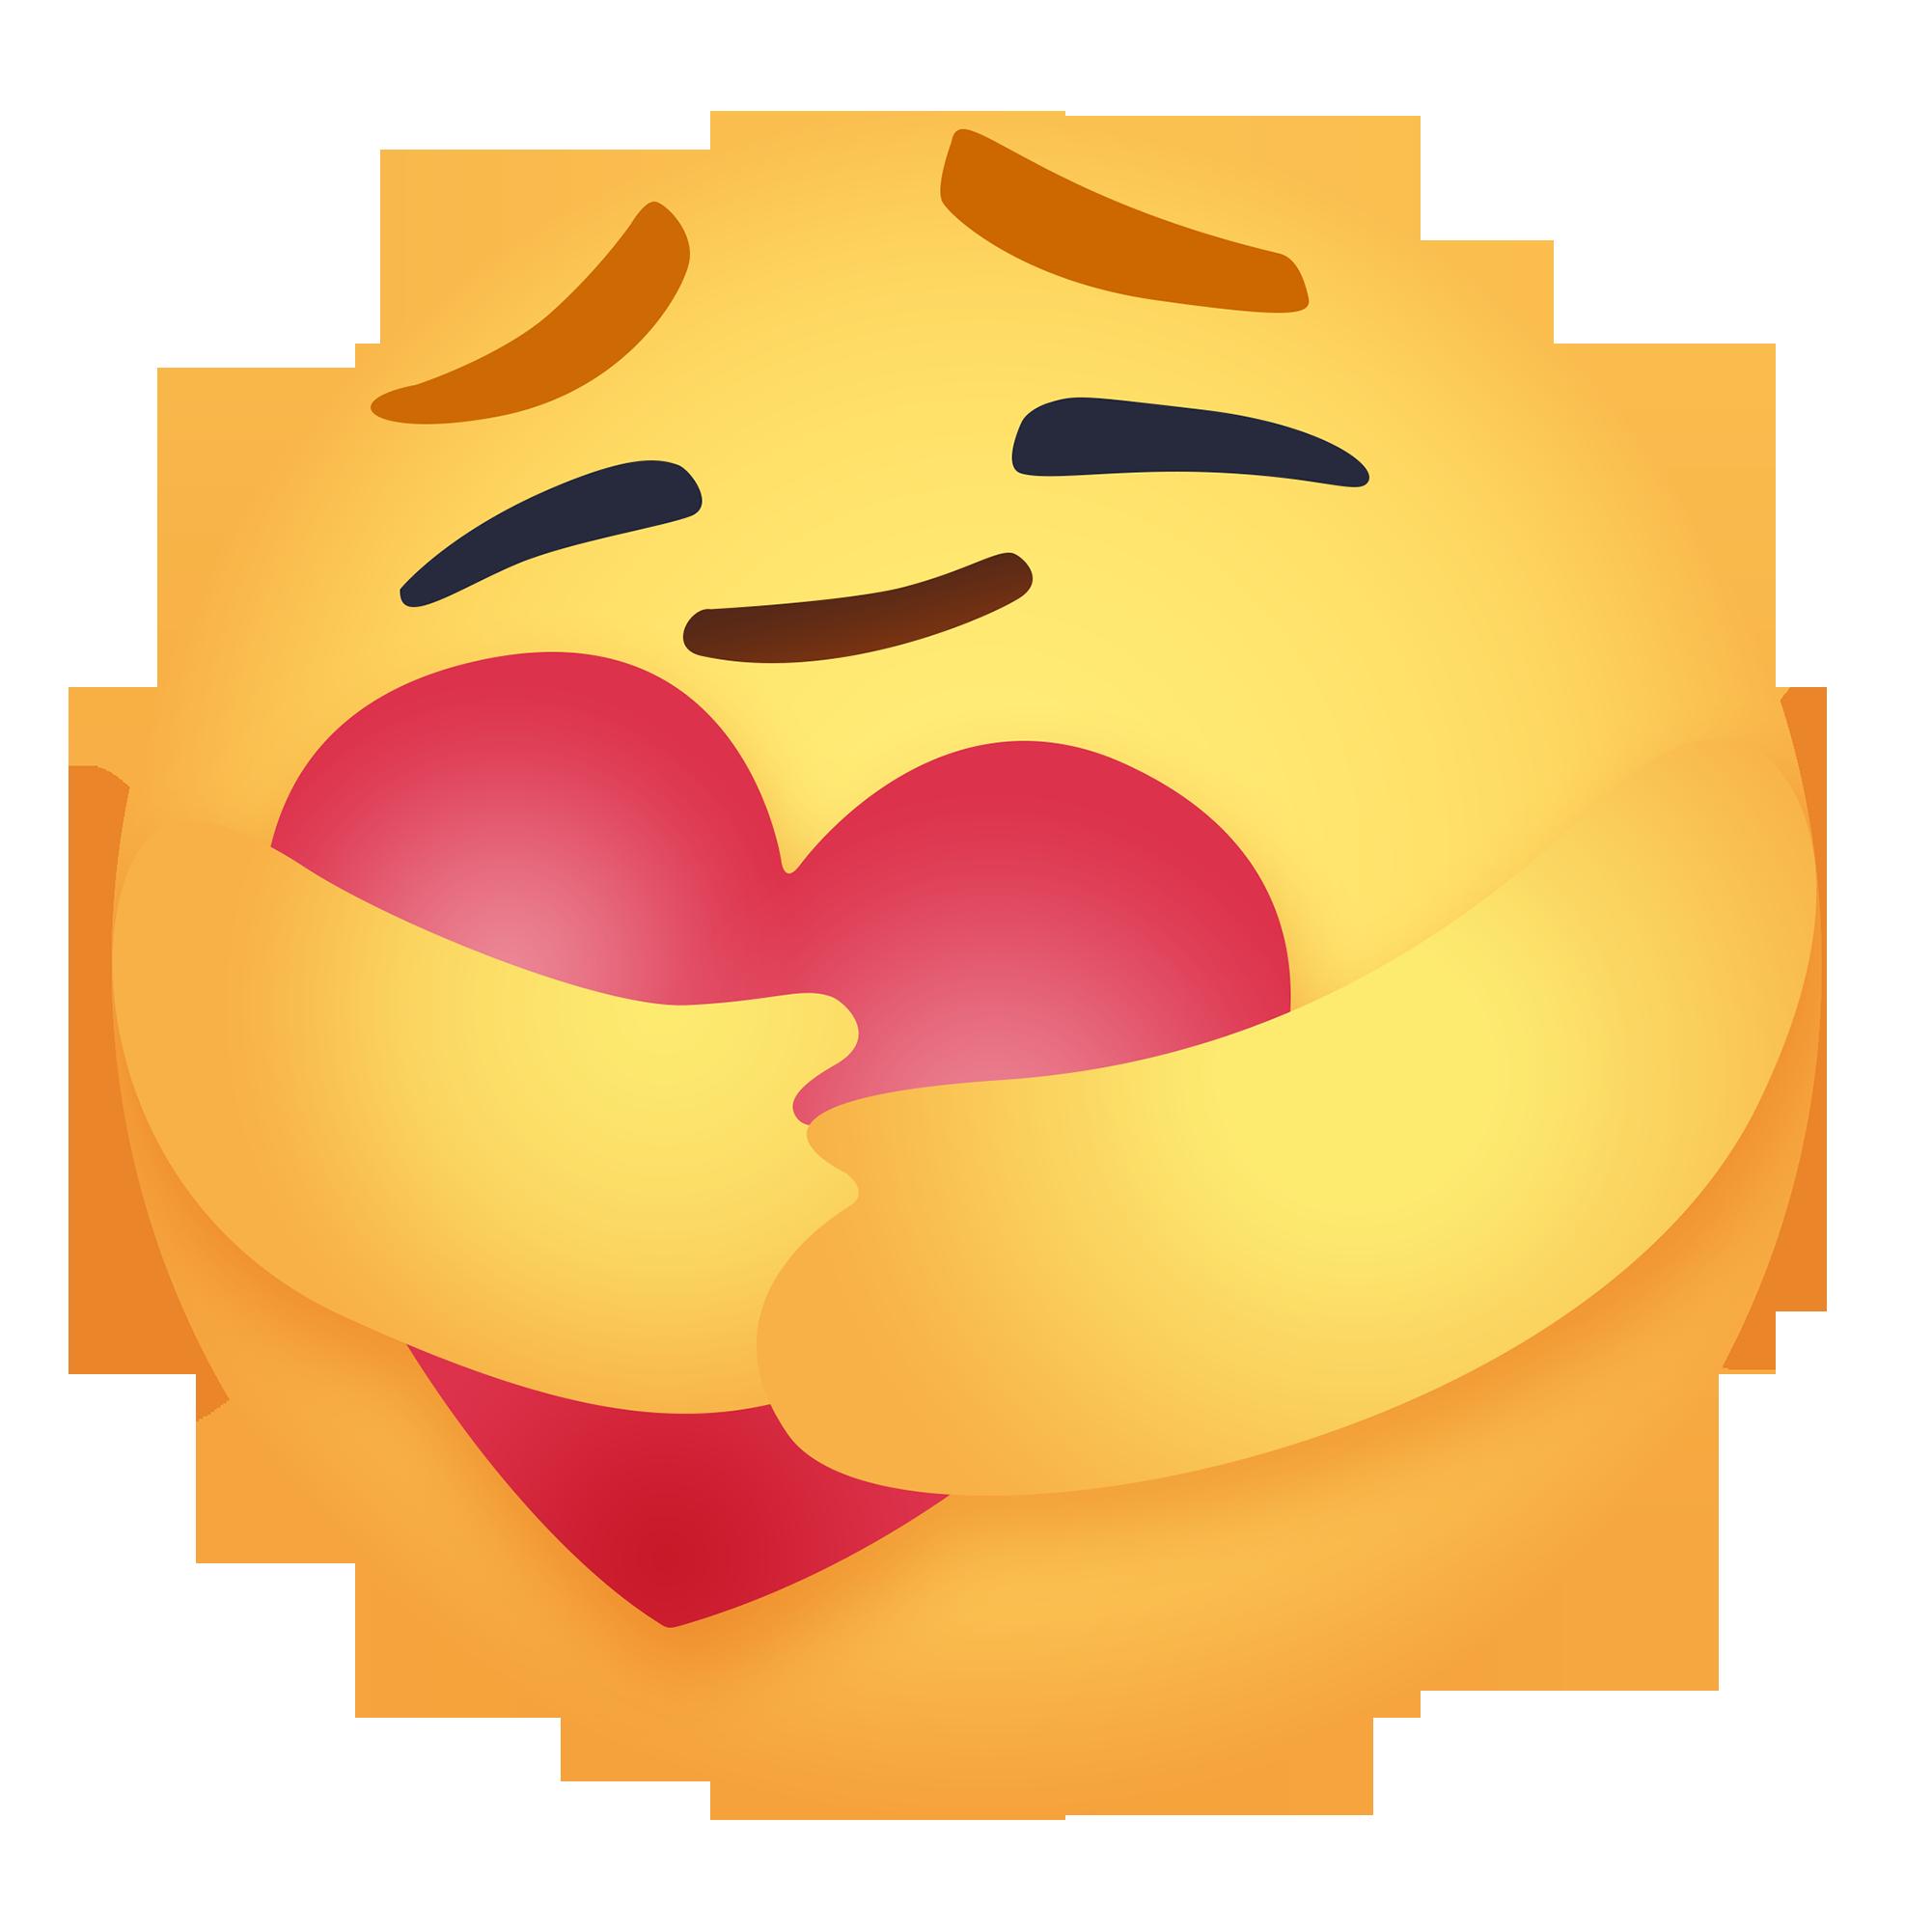 download psd facebook care emoji reaction